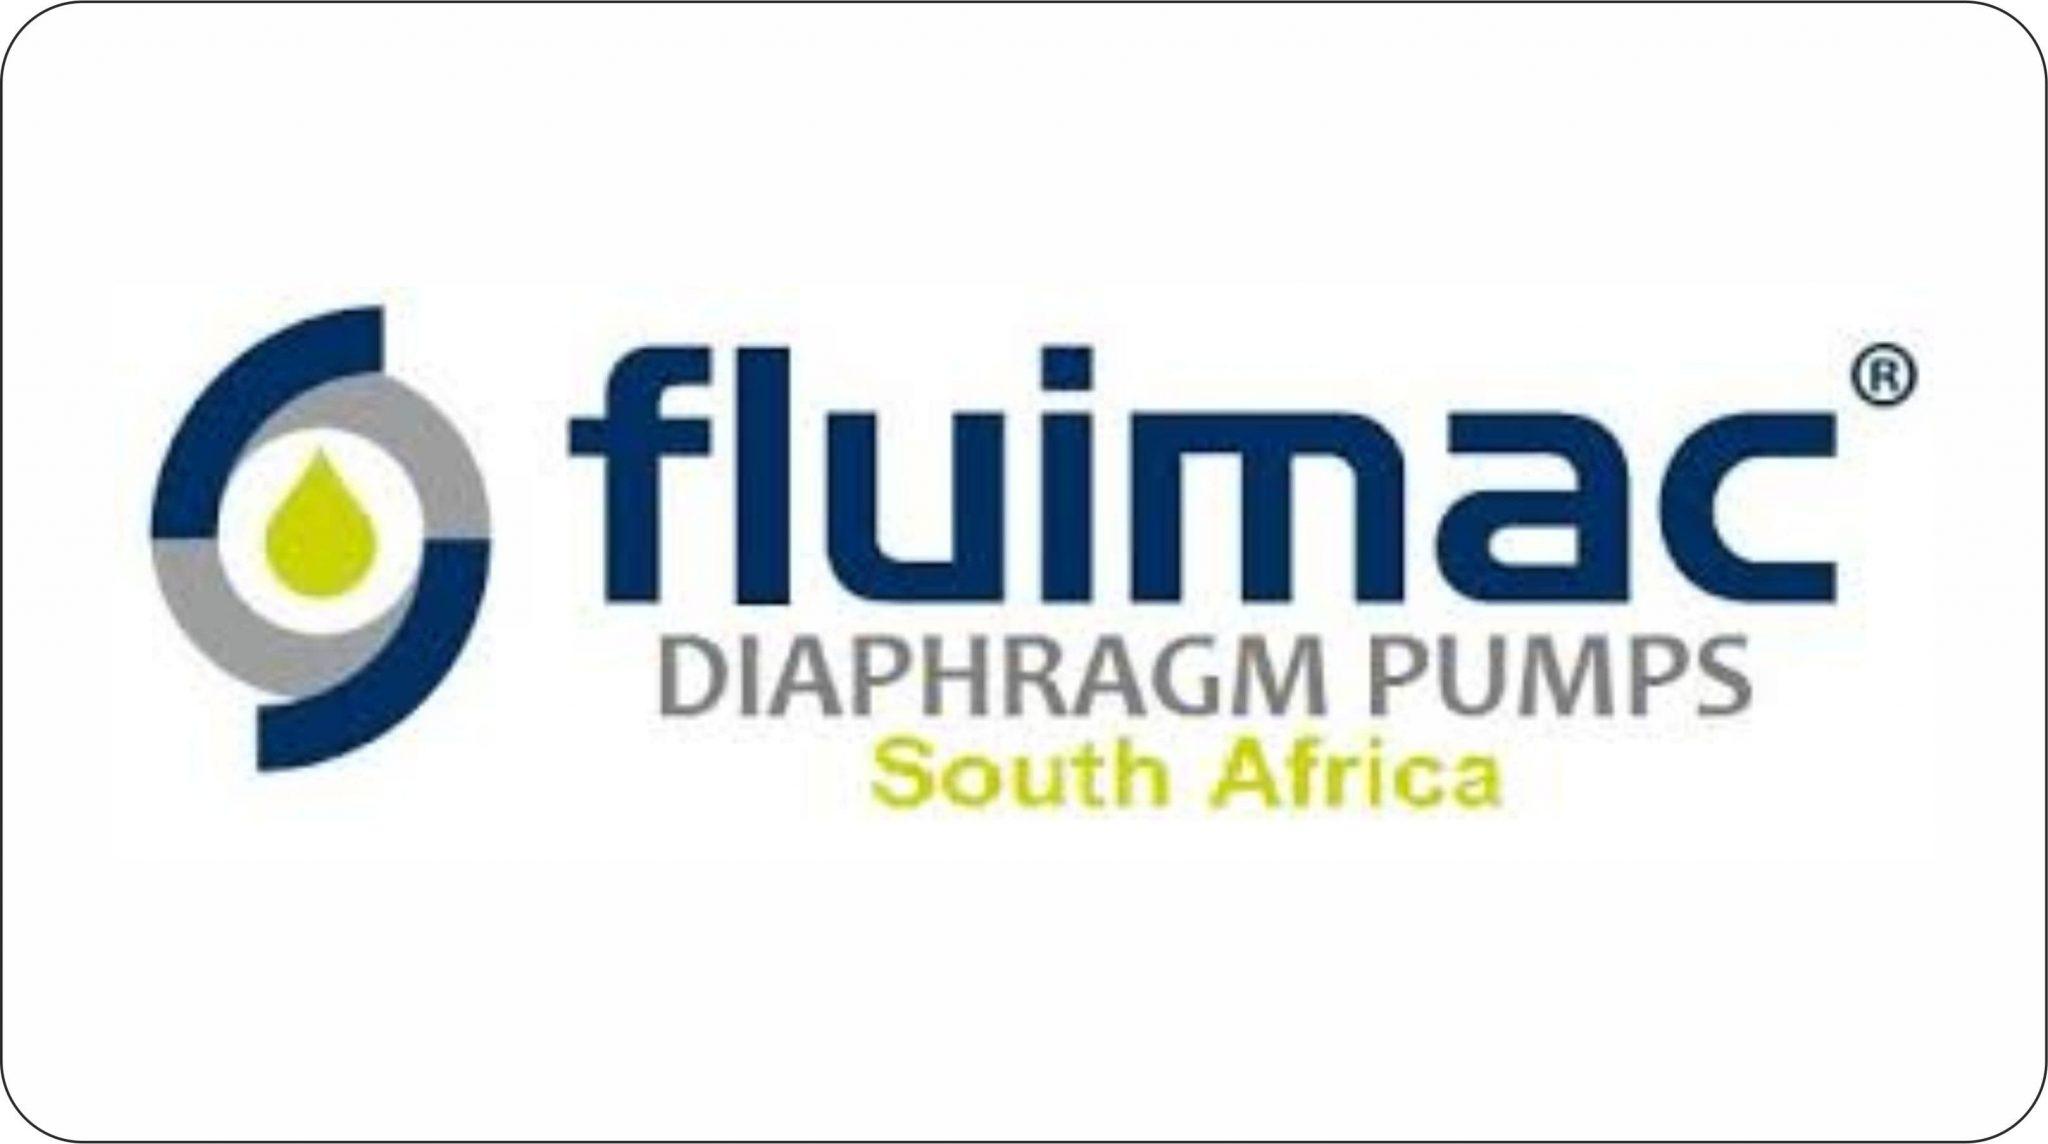 FLUIMAC-min